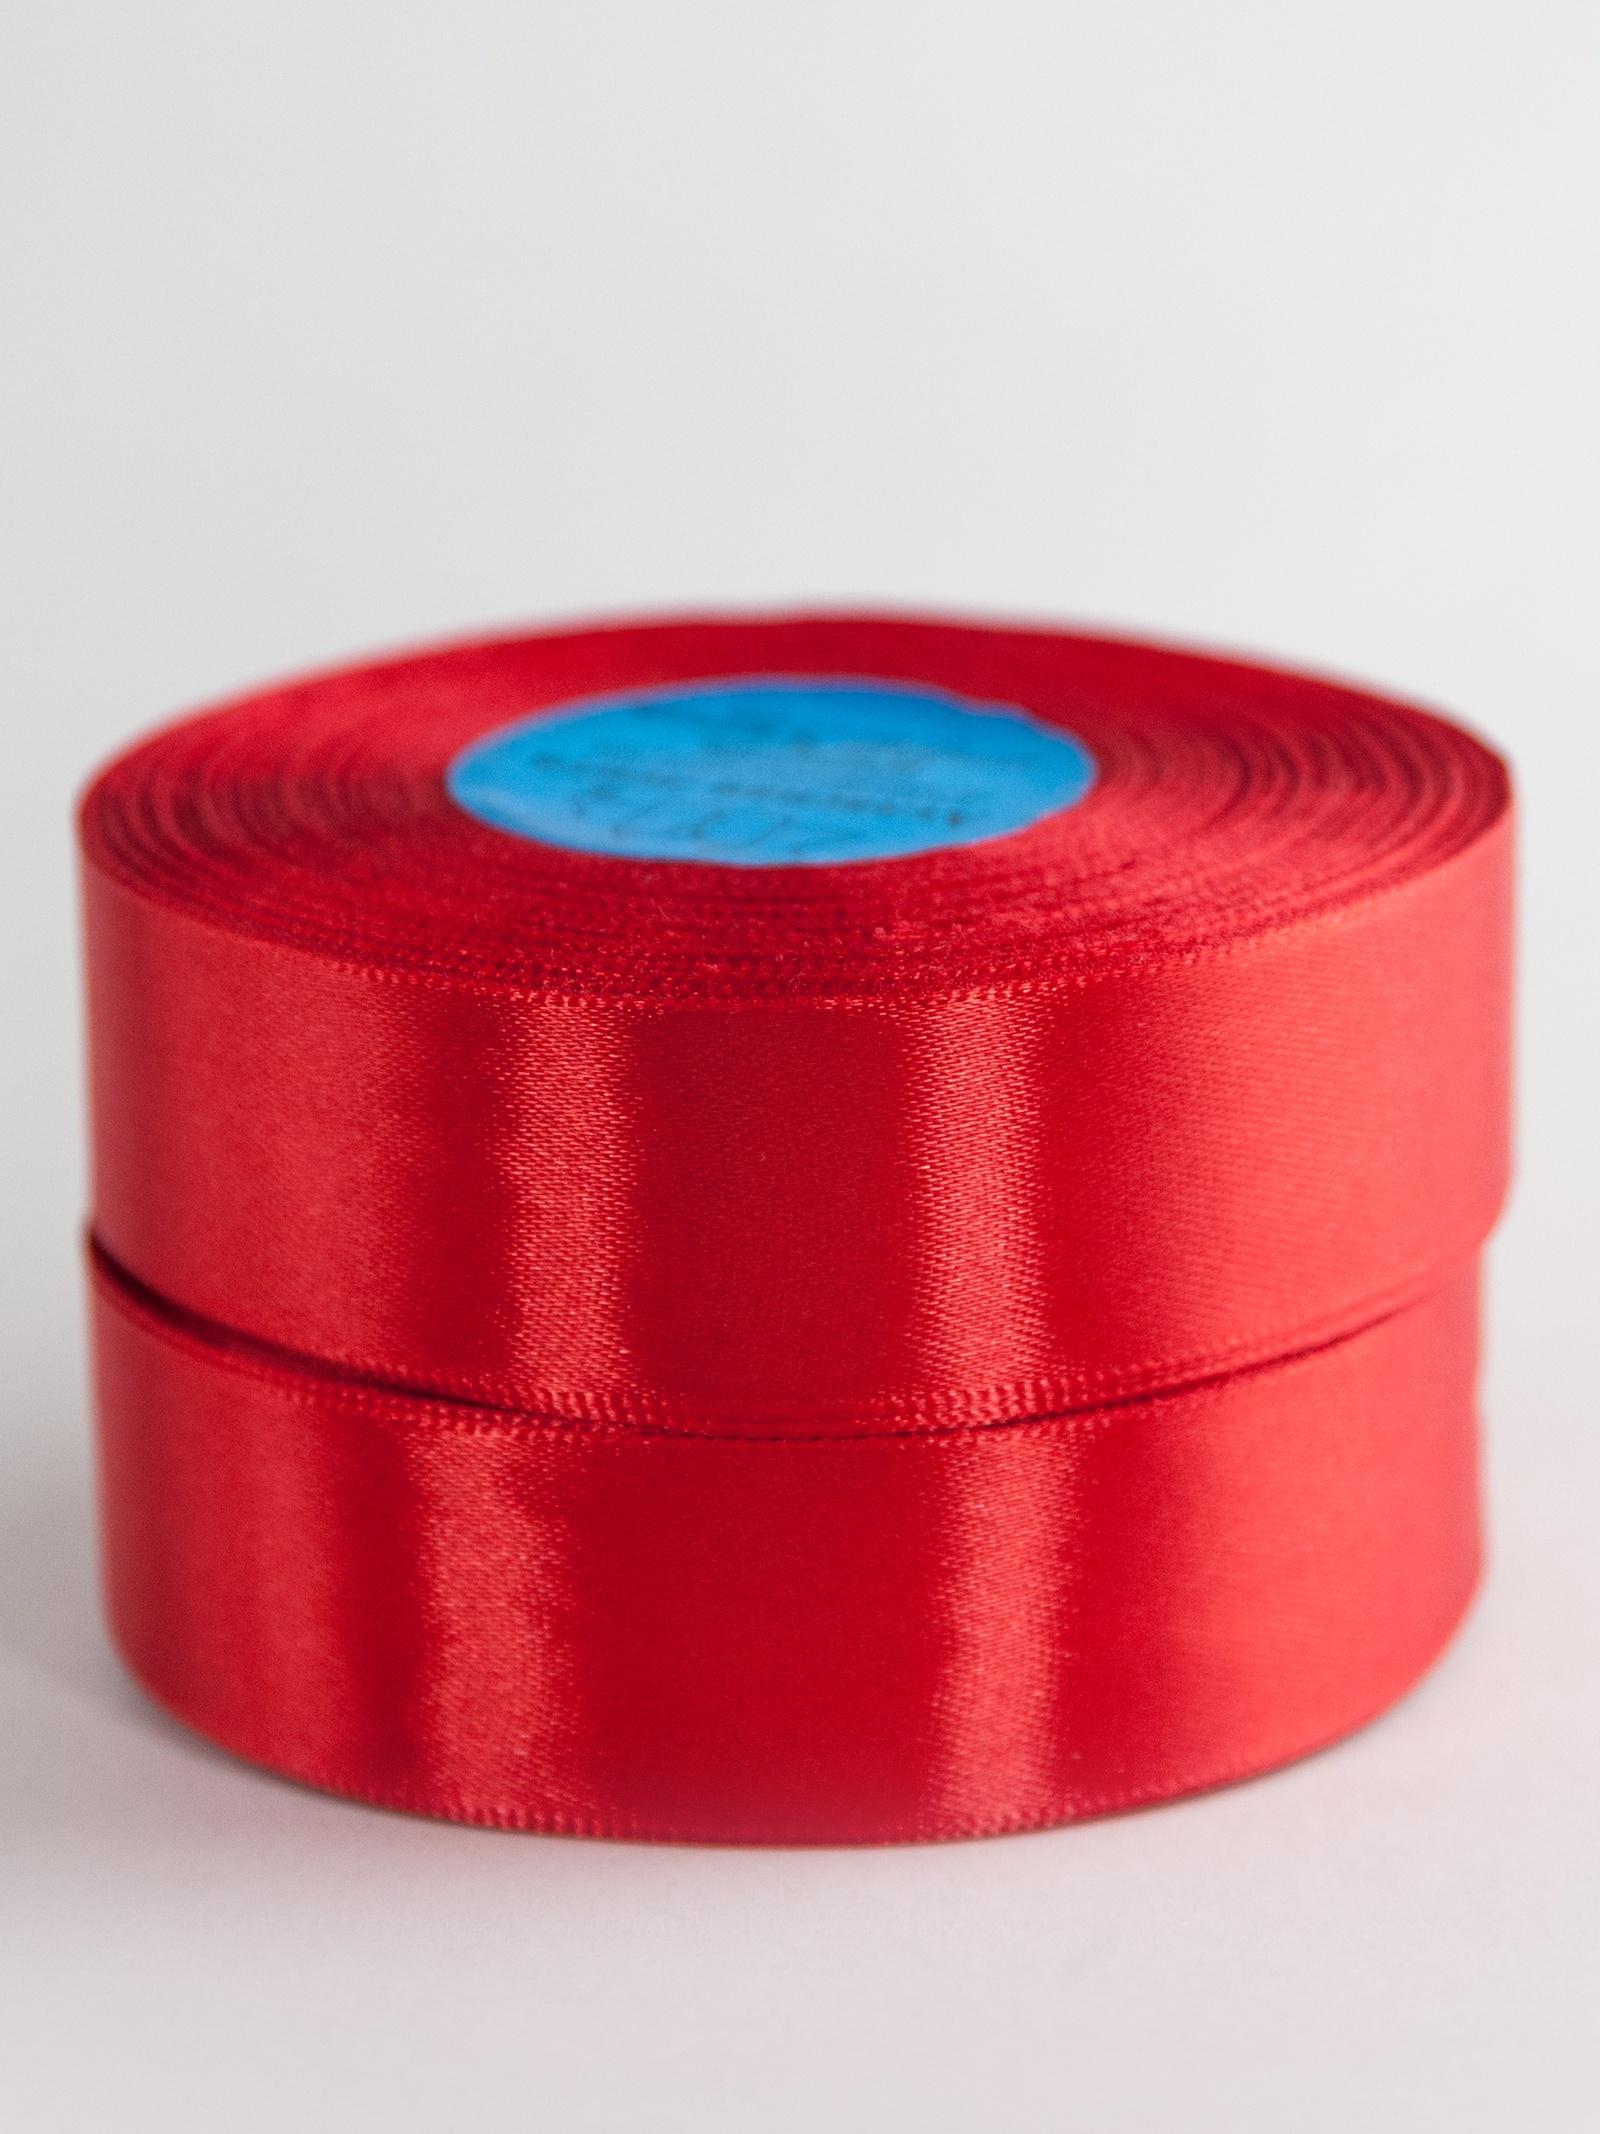 Лента Гамма / Gamma атласная, AL-2,5 25мм 33мх2боб./№026 красный